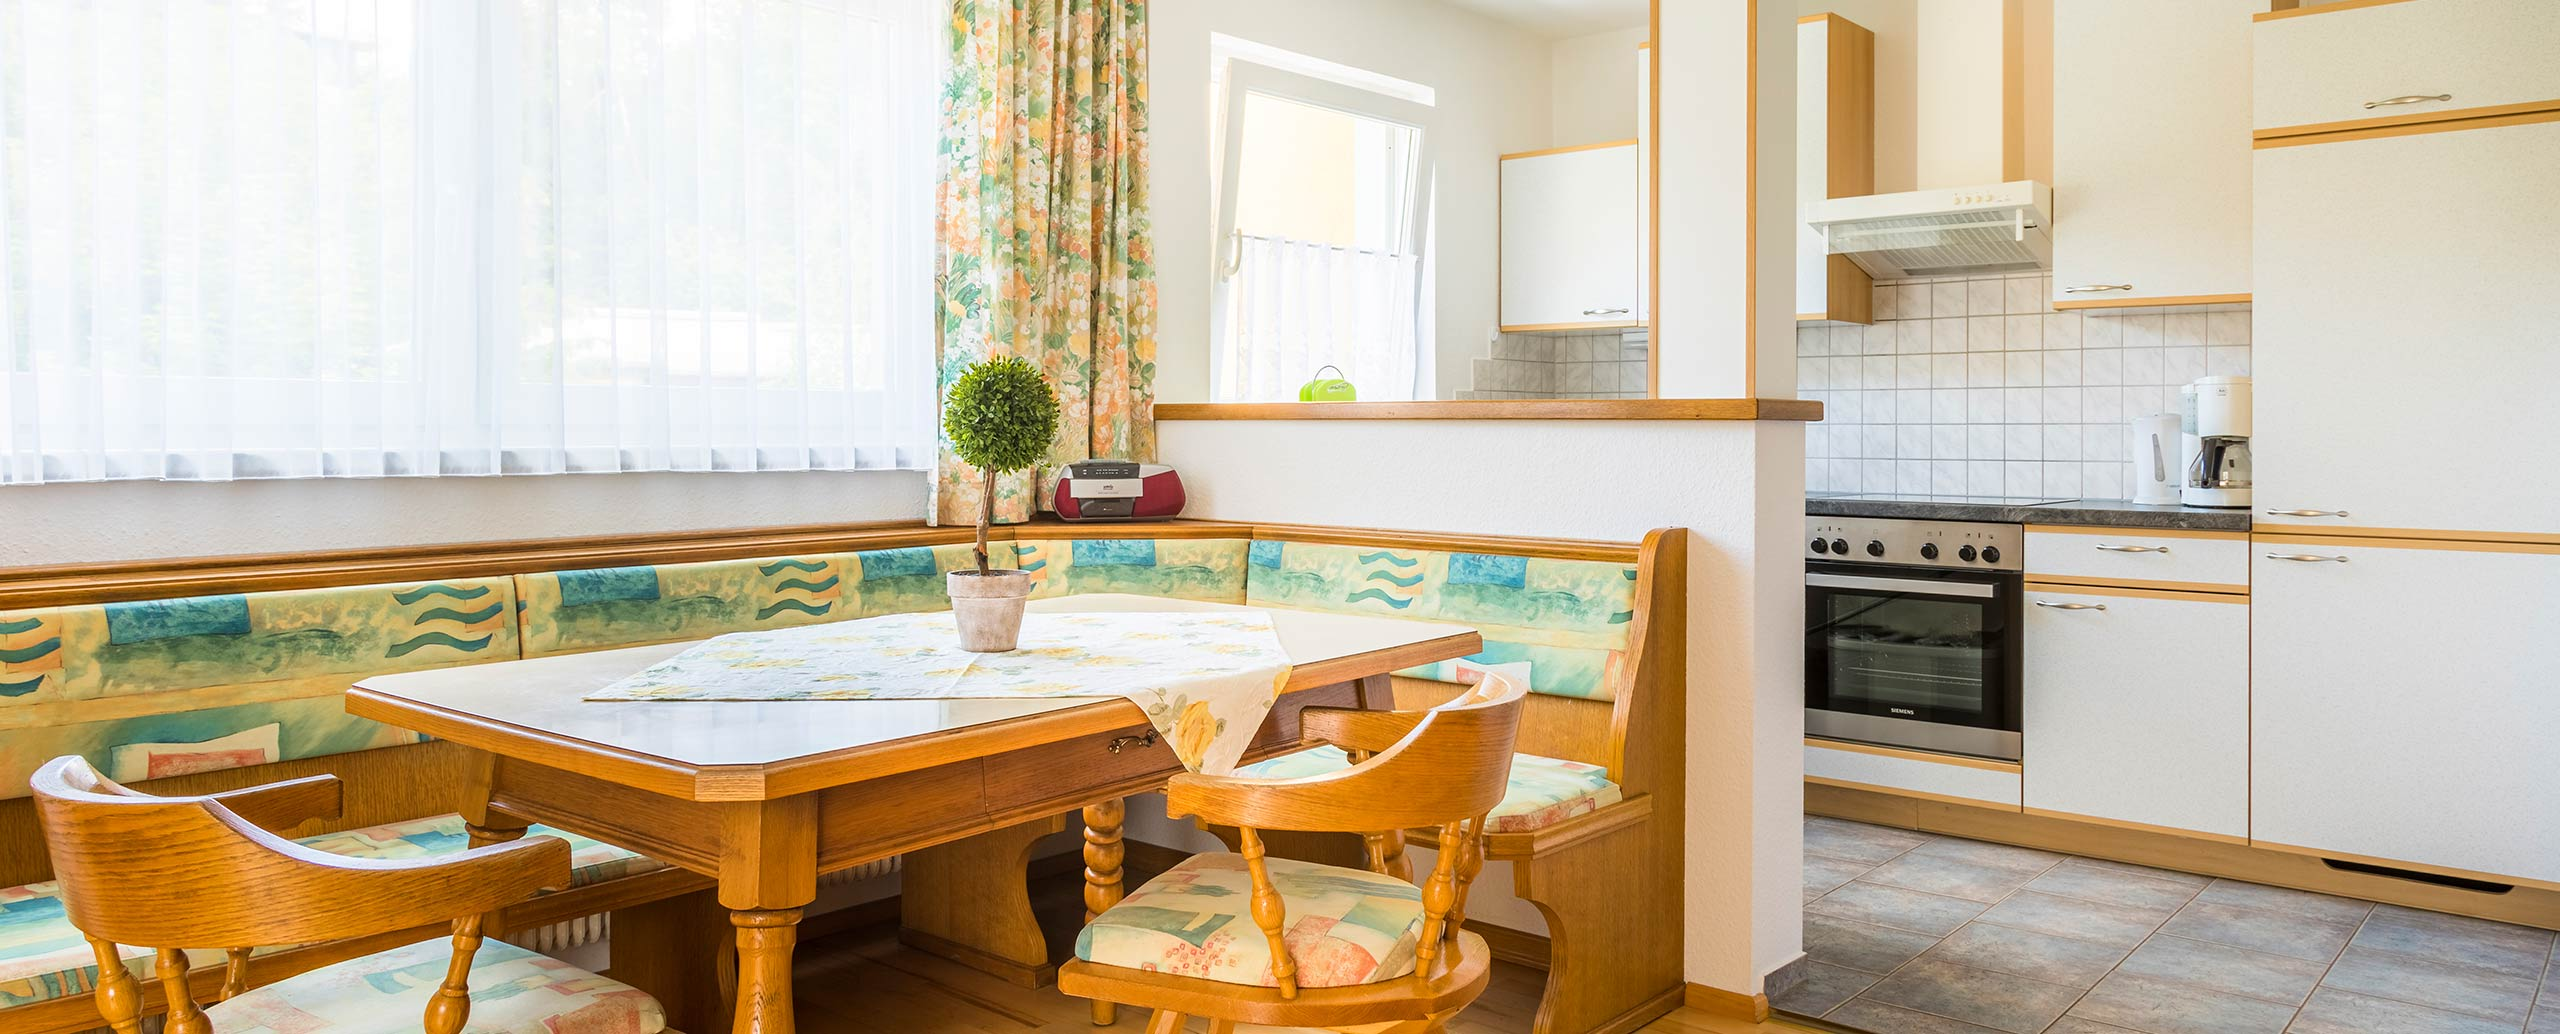 Appartement Bockhartsee